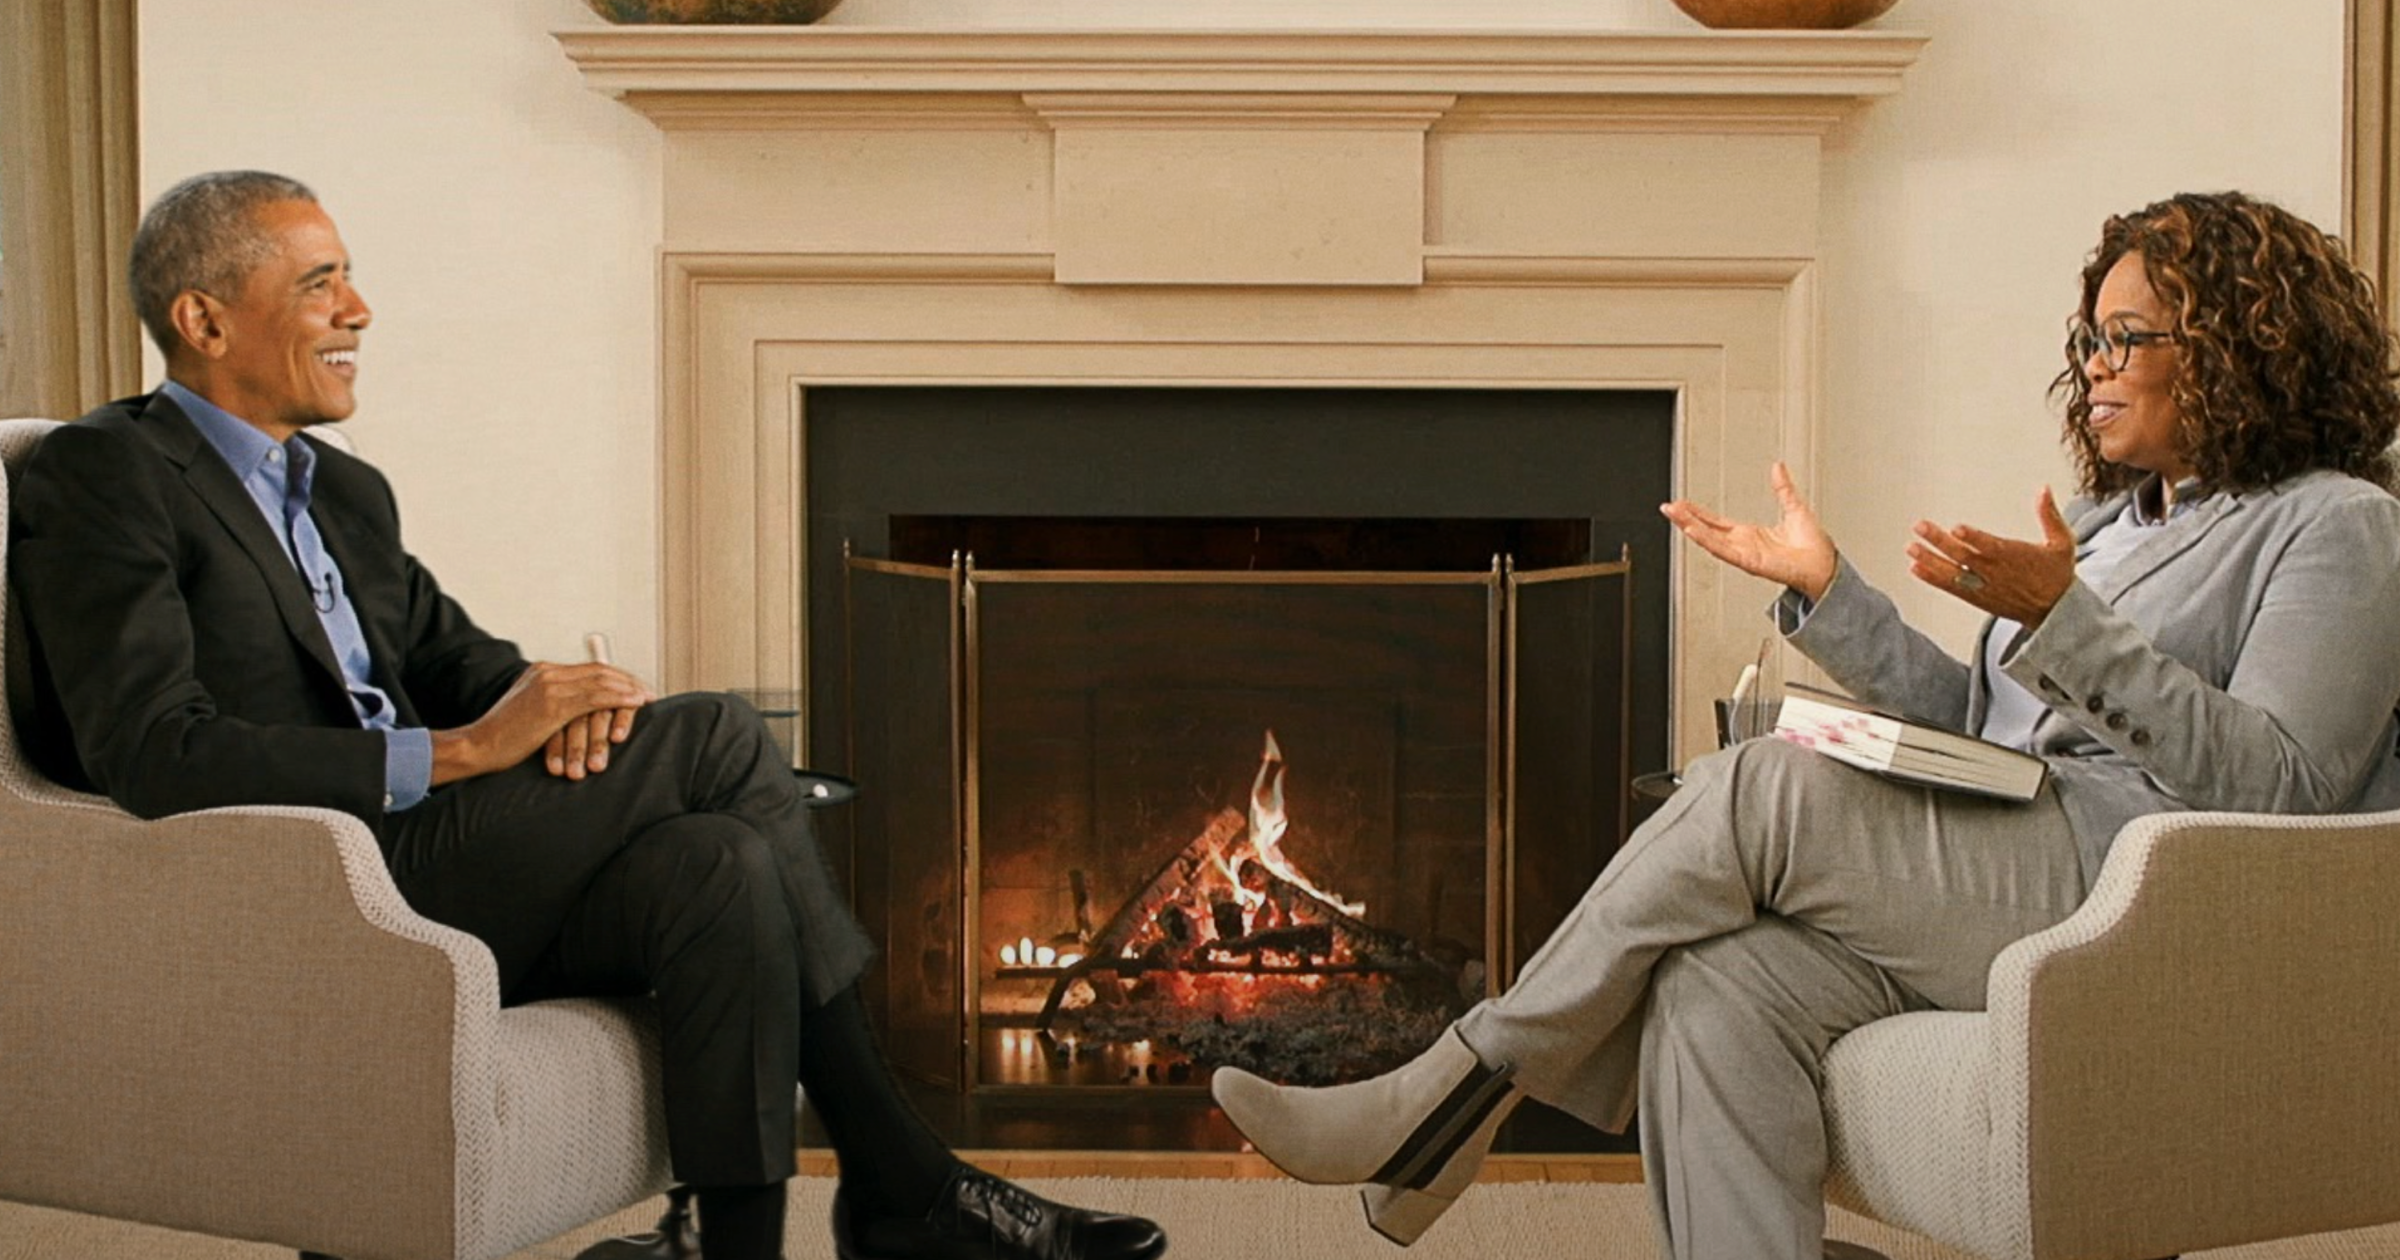 Oprah Winfrey interviewing President Barack Obama on Apple TV+